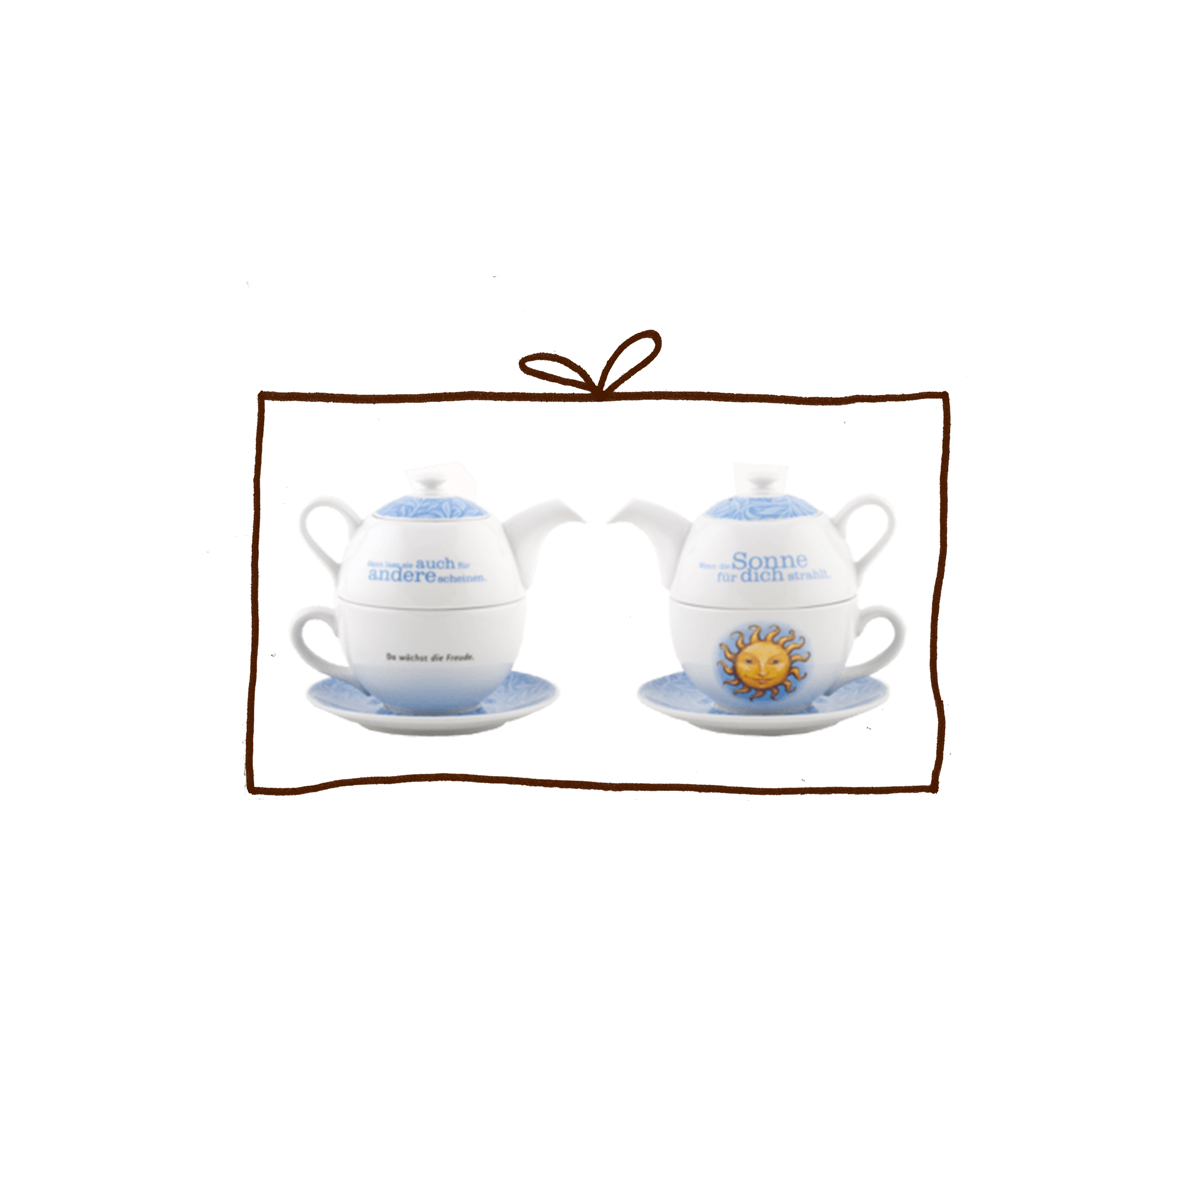 sonnentor tea for one set k nnchen tasse 500ml mahler co feine biowaren. Black Bedroom Furniture Sets. Home Design Ideas